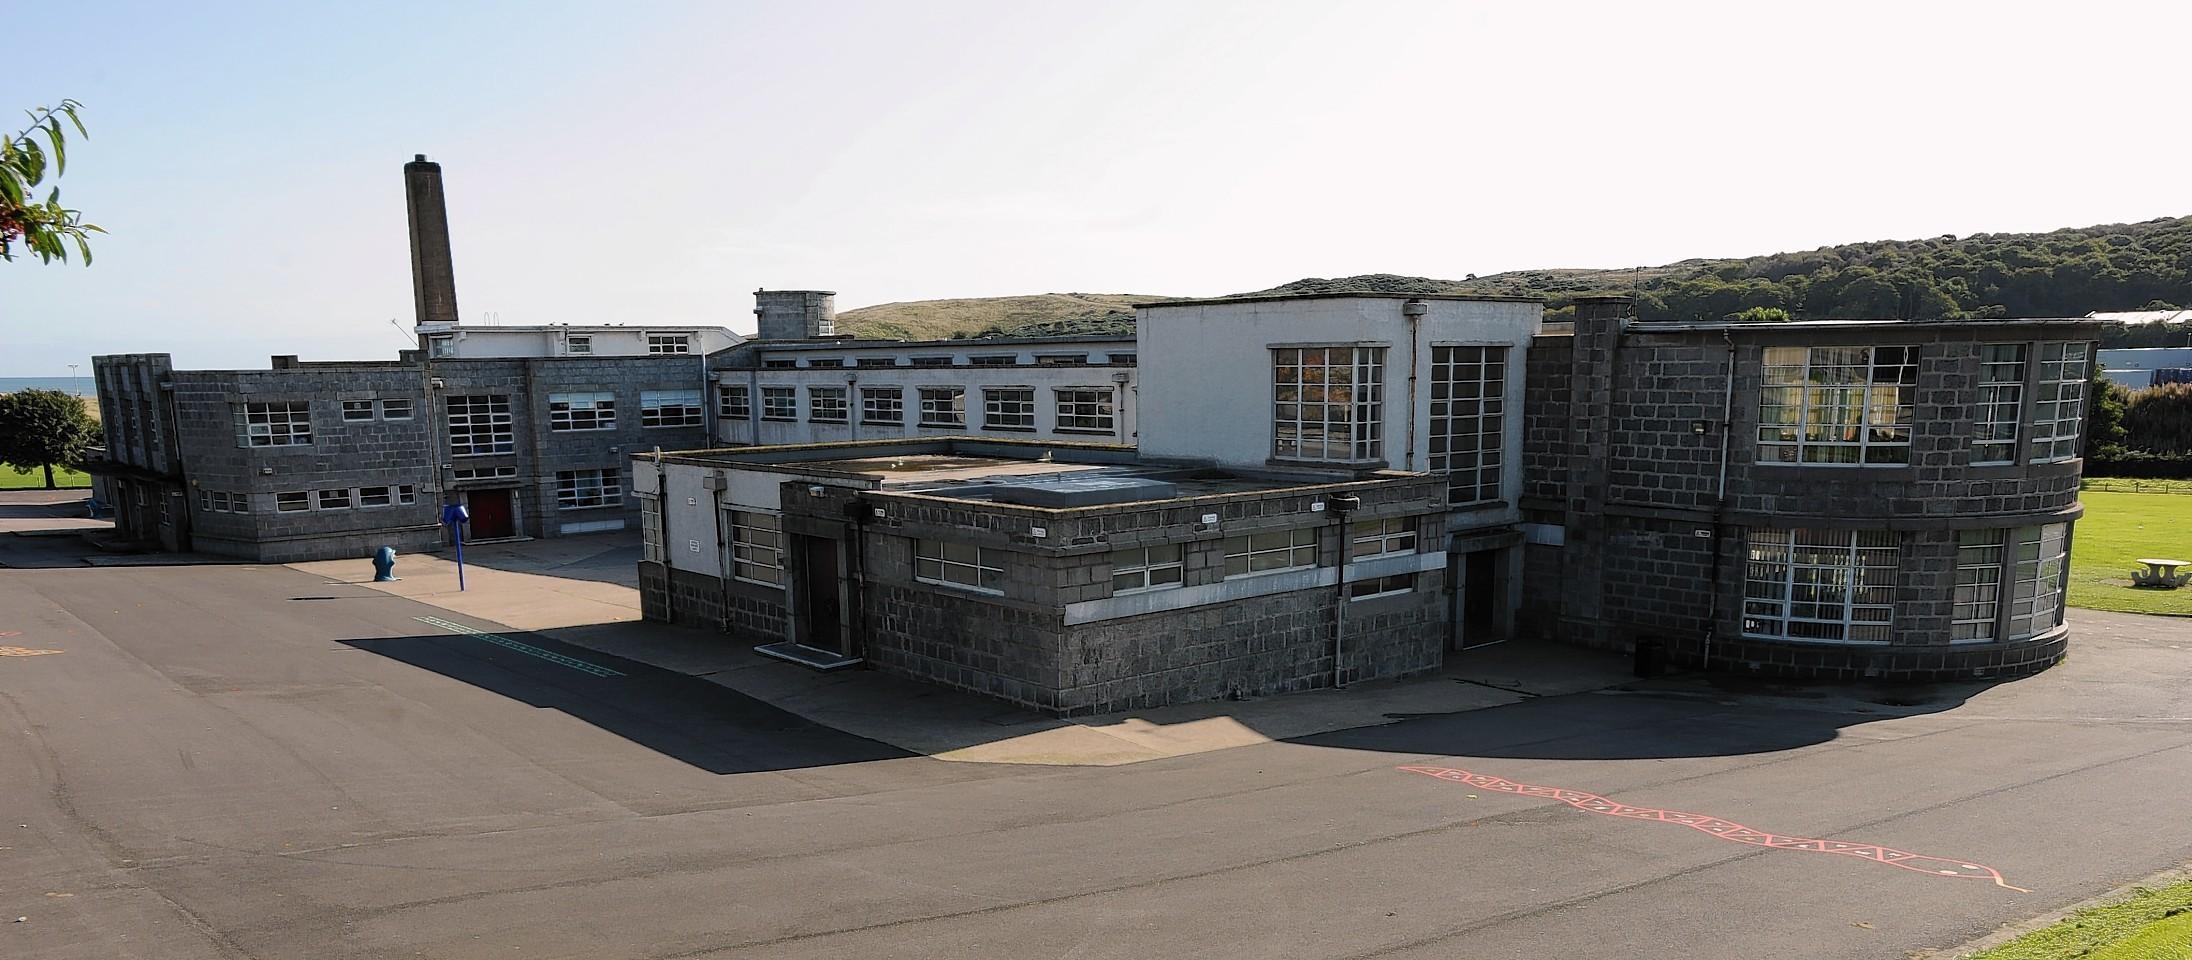 Tullos Primary School, Aberdeen has been attacked by vandals